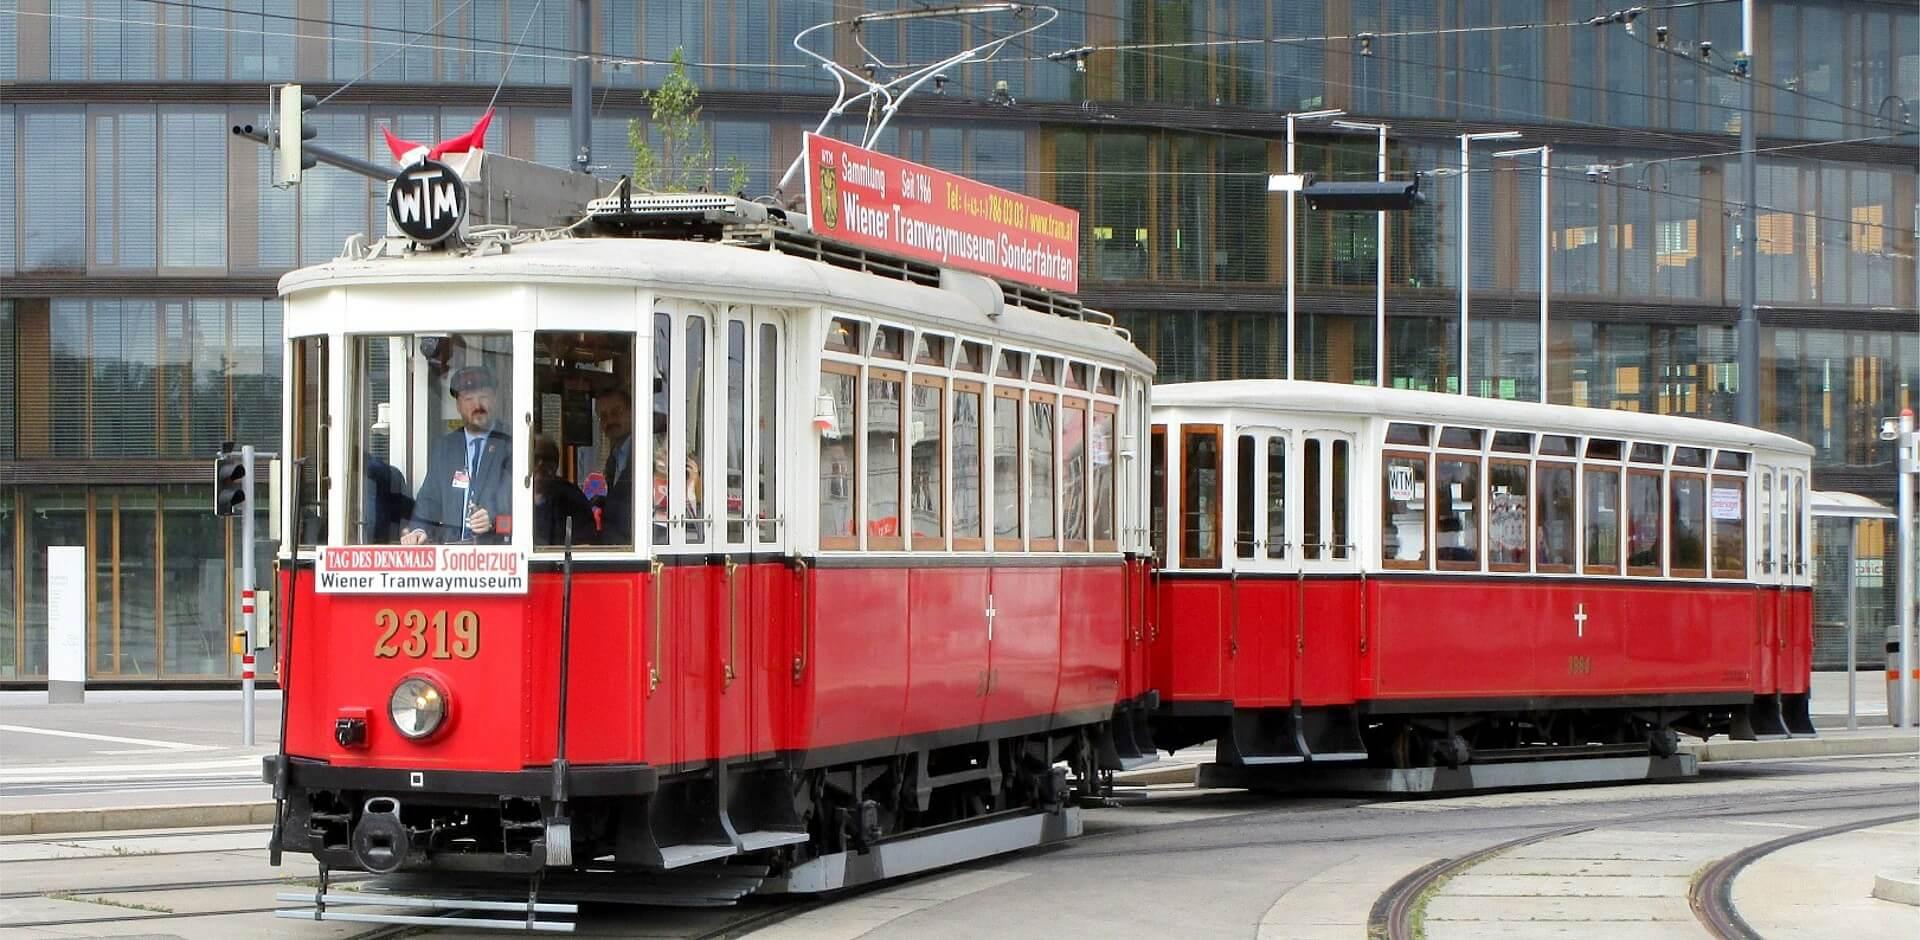 Wiener Tramwaymuseum am Tag des Denkmals 2018 in Wien